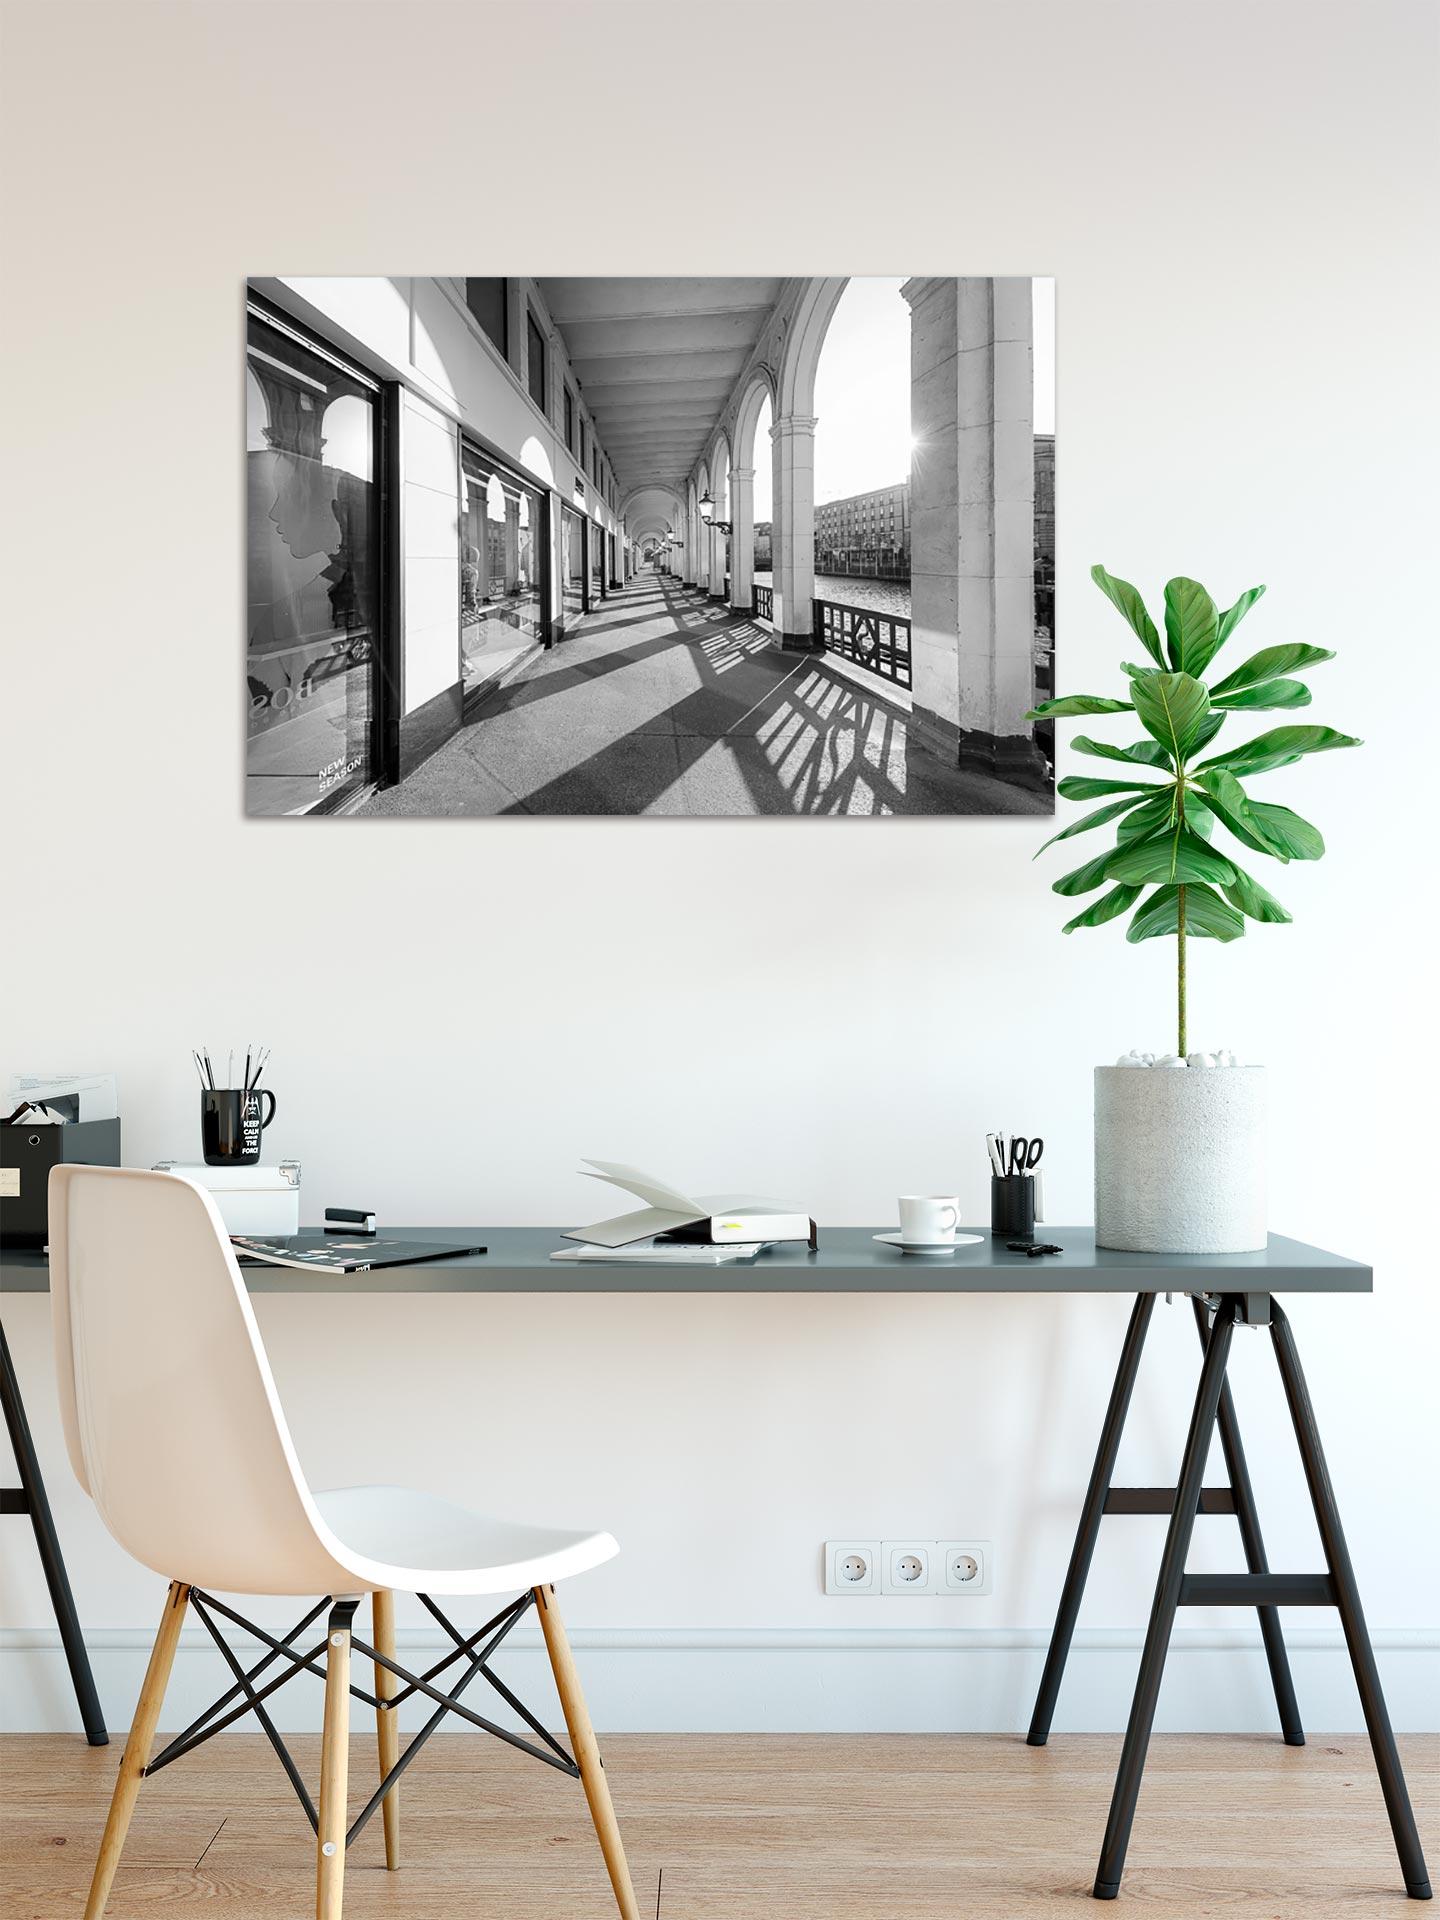 LSW105-alsterarkaden-wandbild-auf-leinwand-acrylglas-aludibond-arbeitszimmer